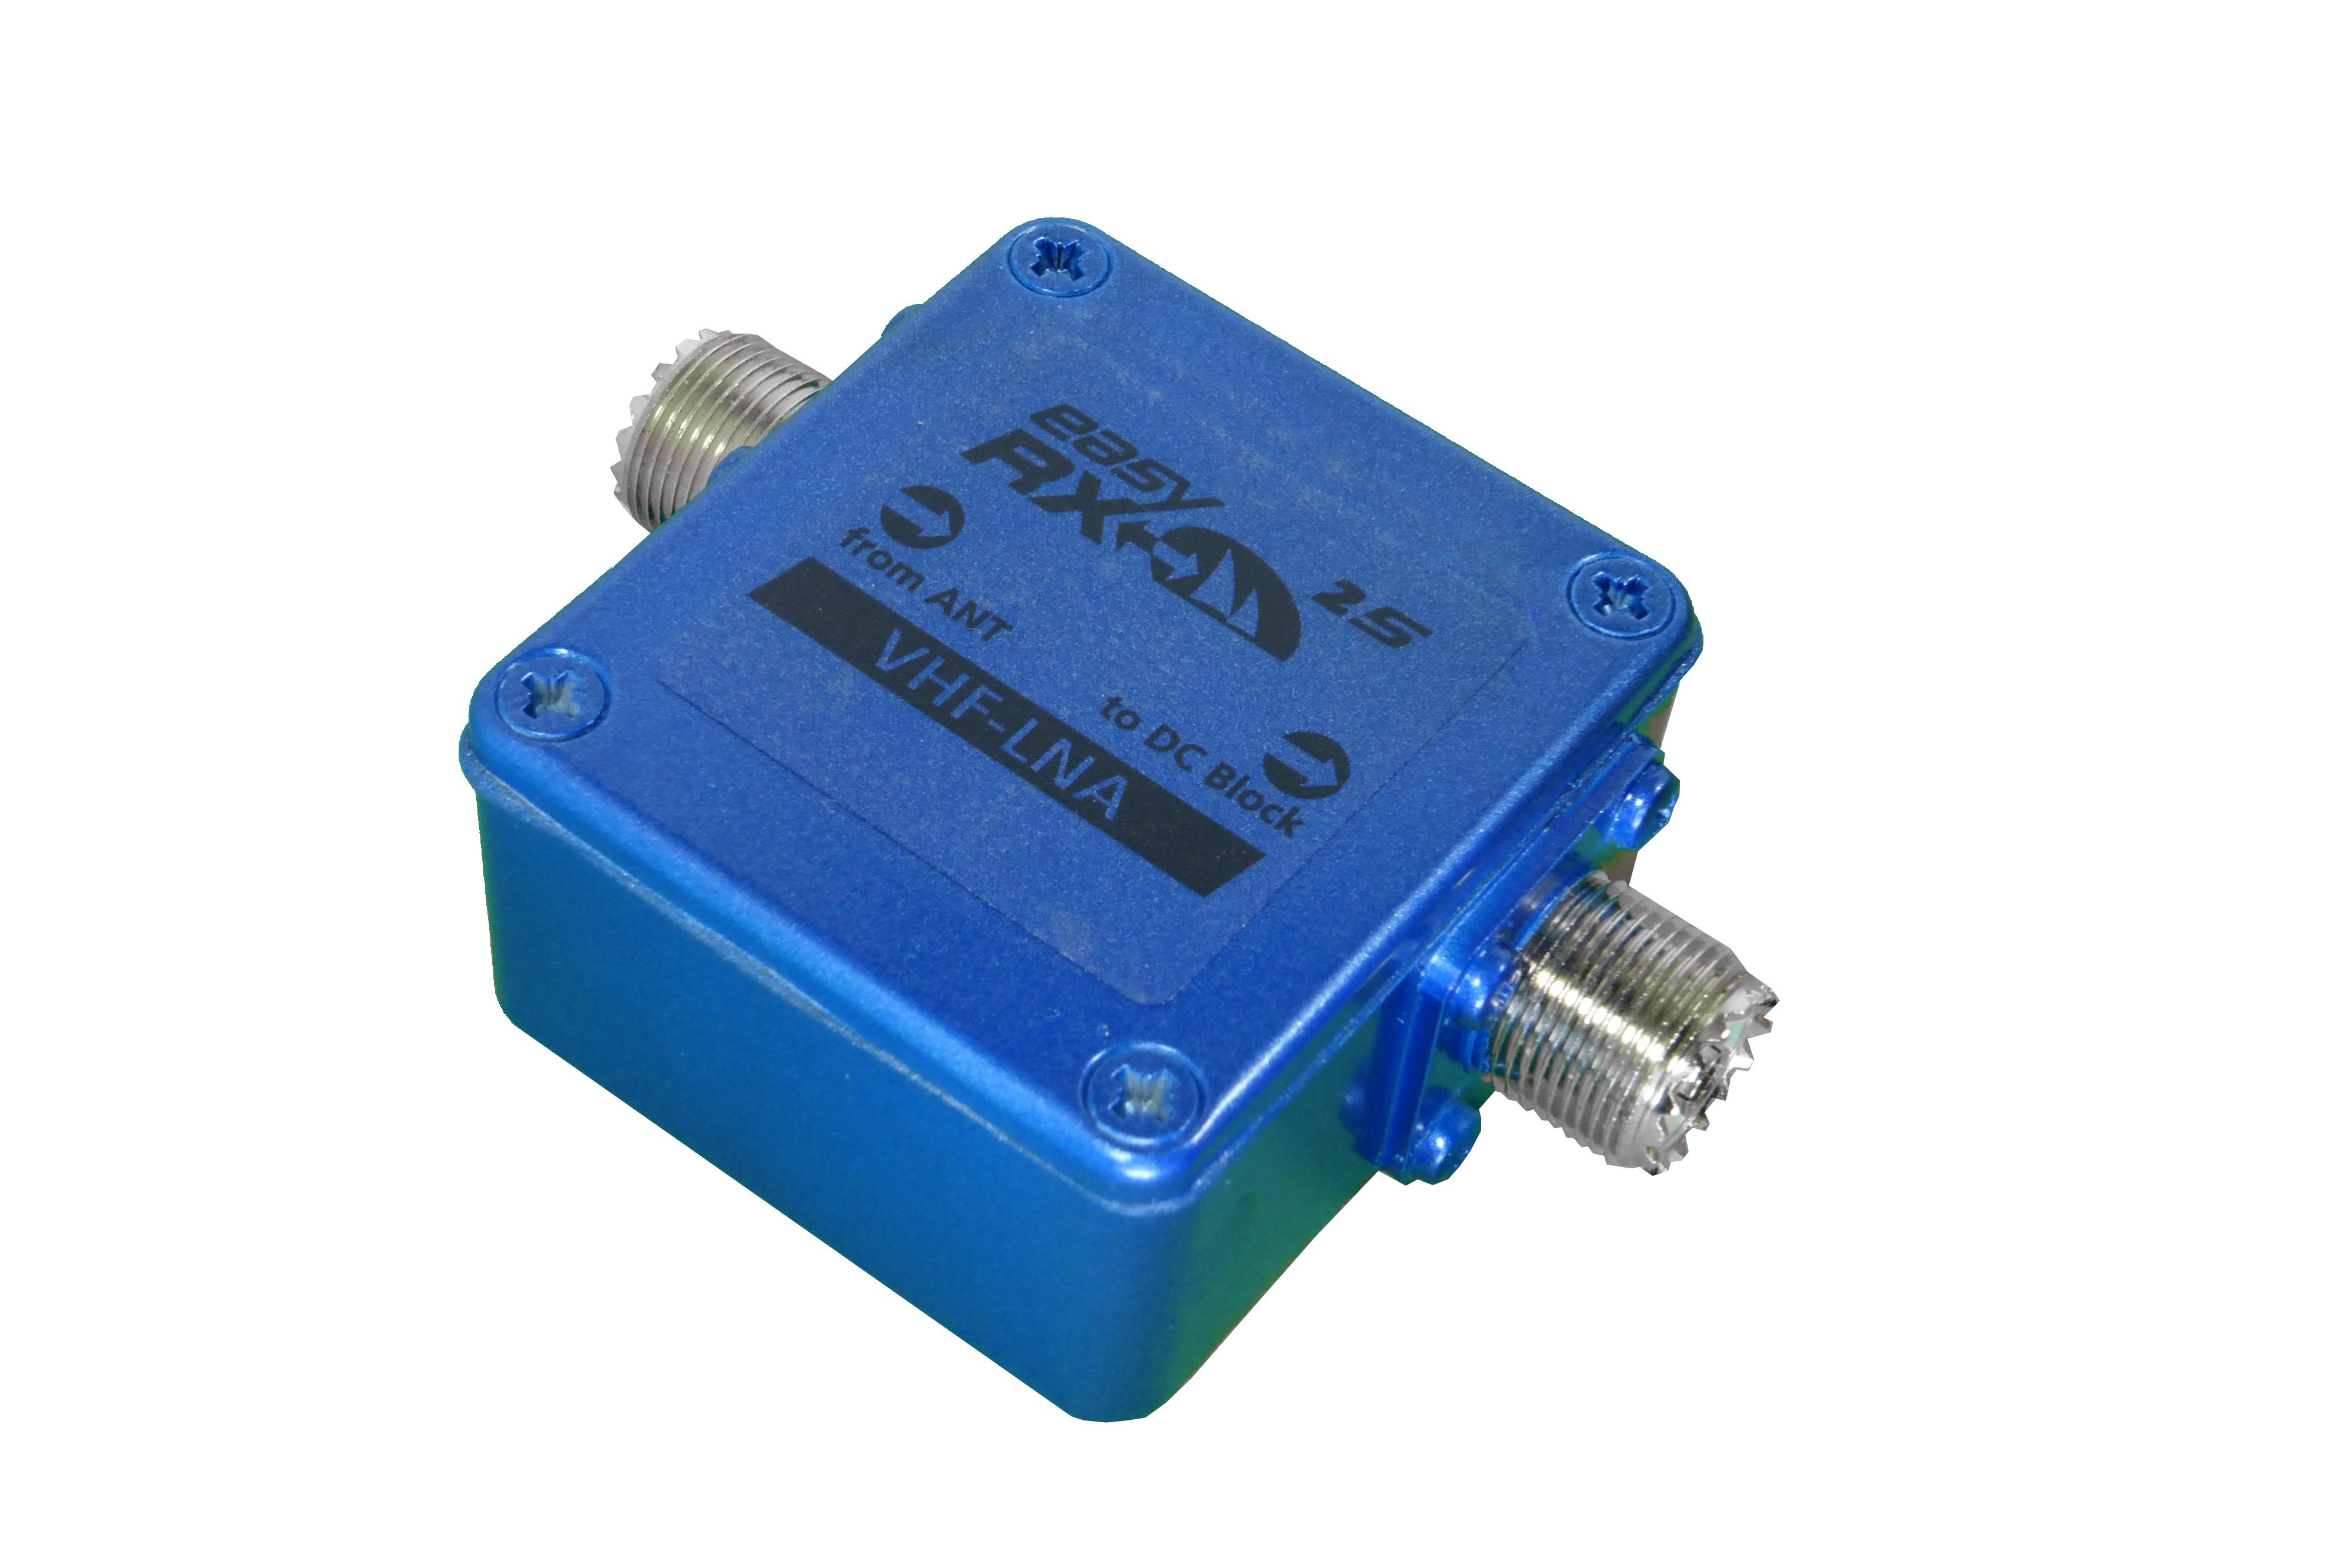 A184_VHF-LNA_Produktbild